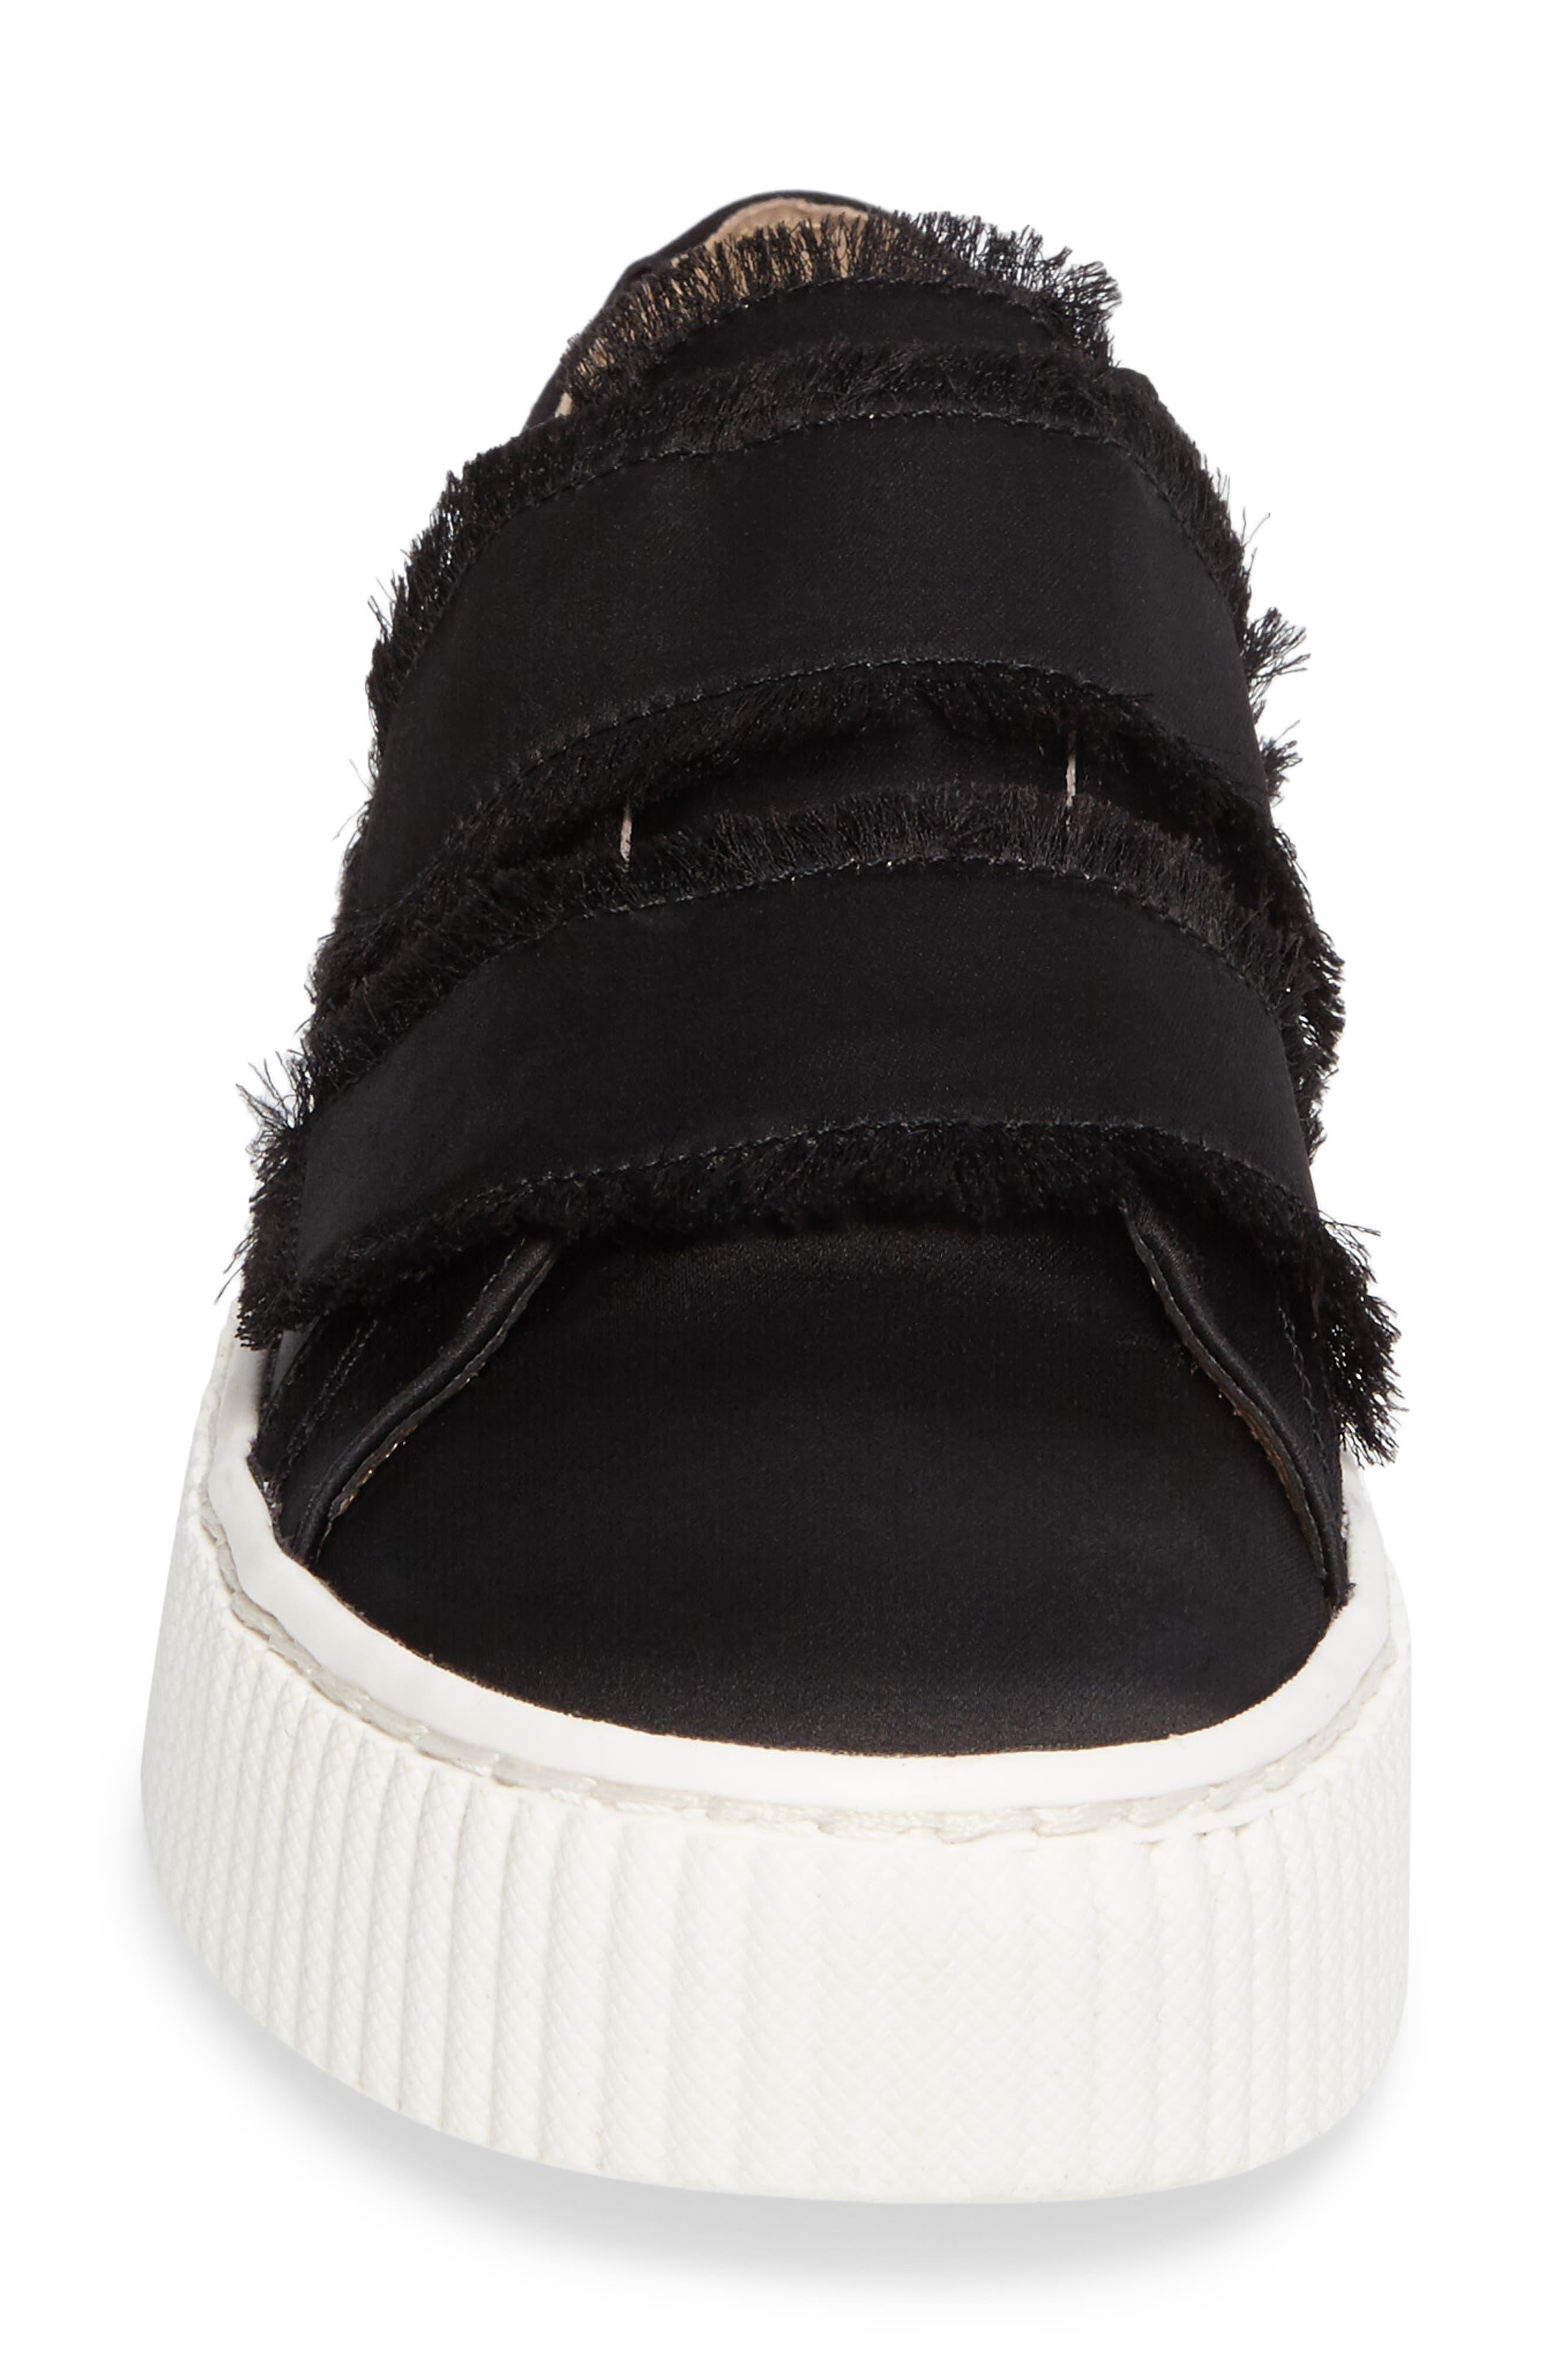 Elder Fringed Platform Sneaker,                             Alternate thumbnail 4, color,                             Black